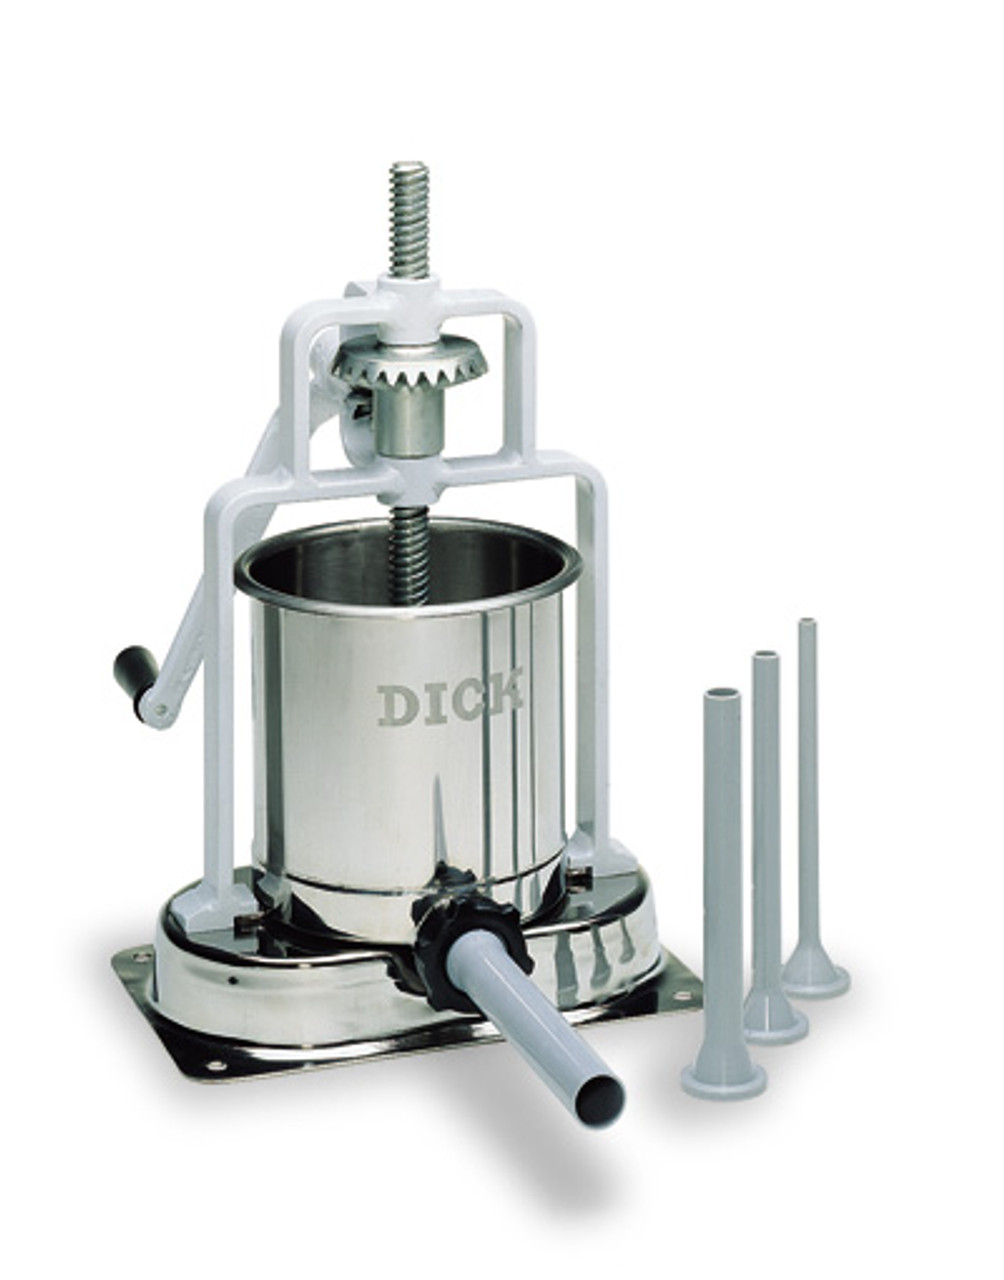 F Dick 9060600-6 ltr/12 lb Capacity Sausage Stuffer / Filler